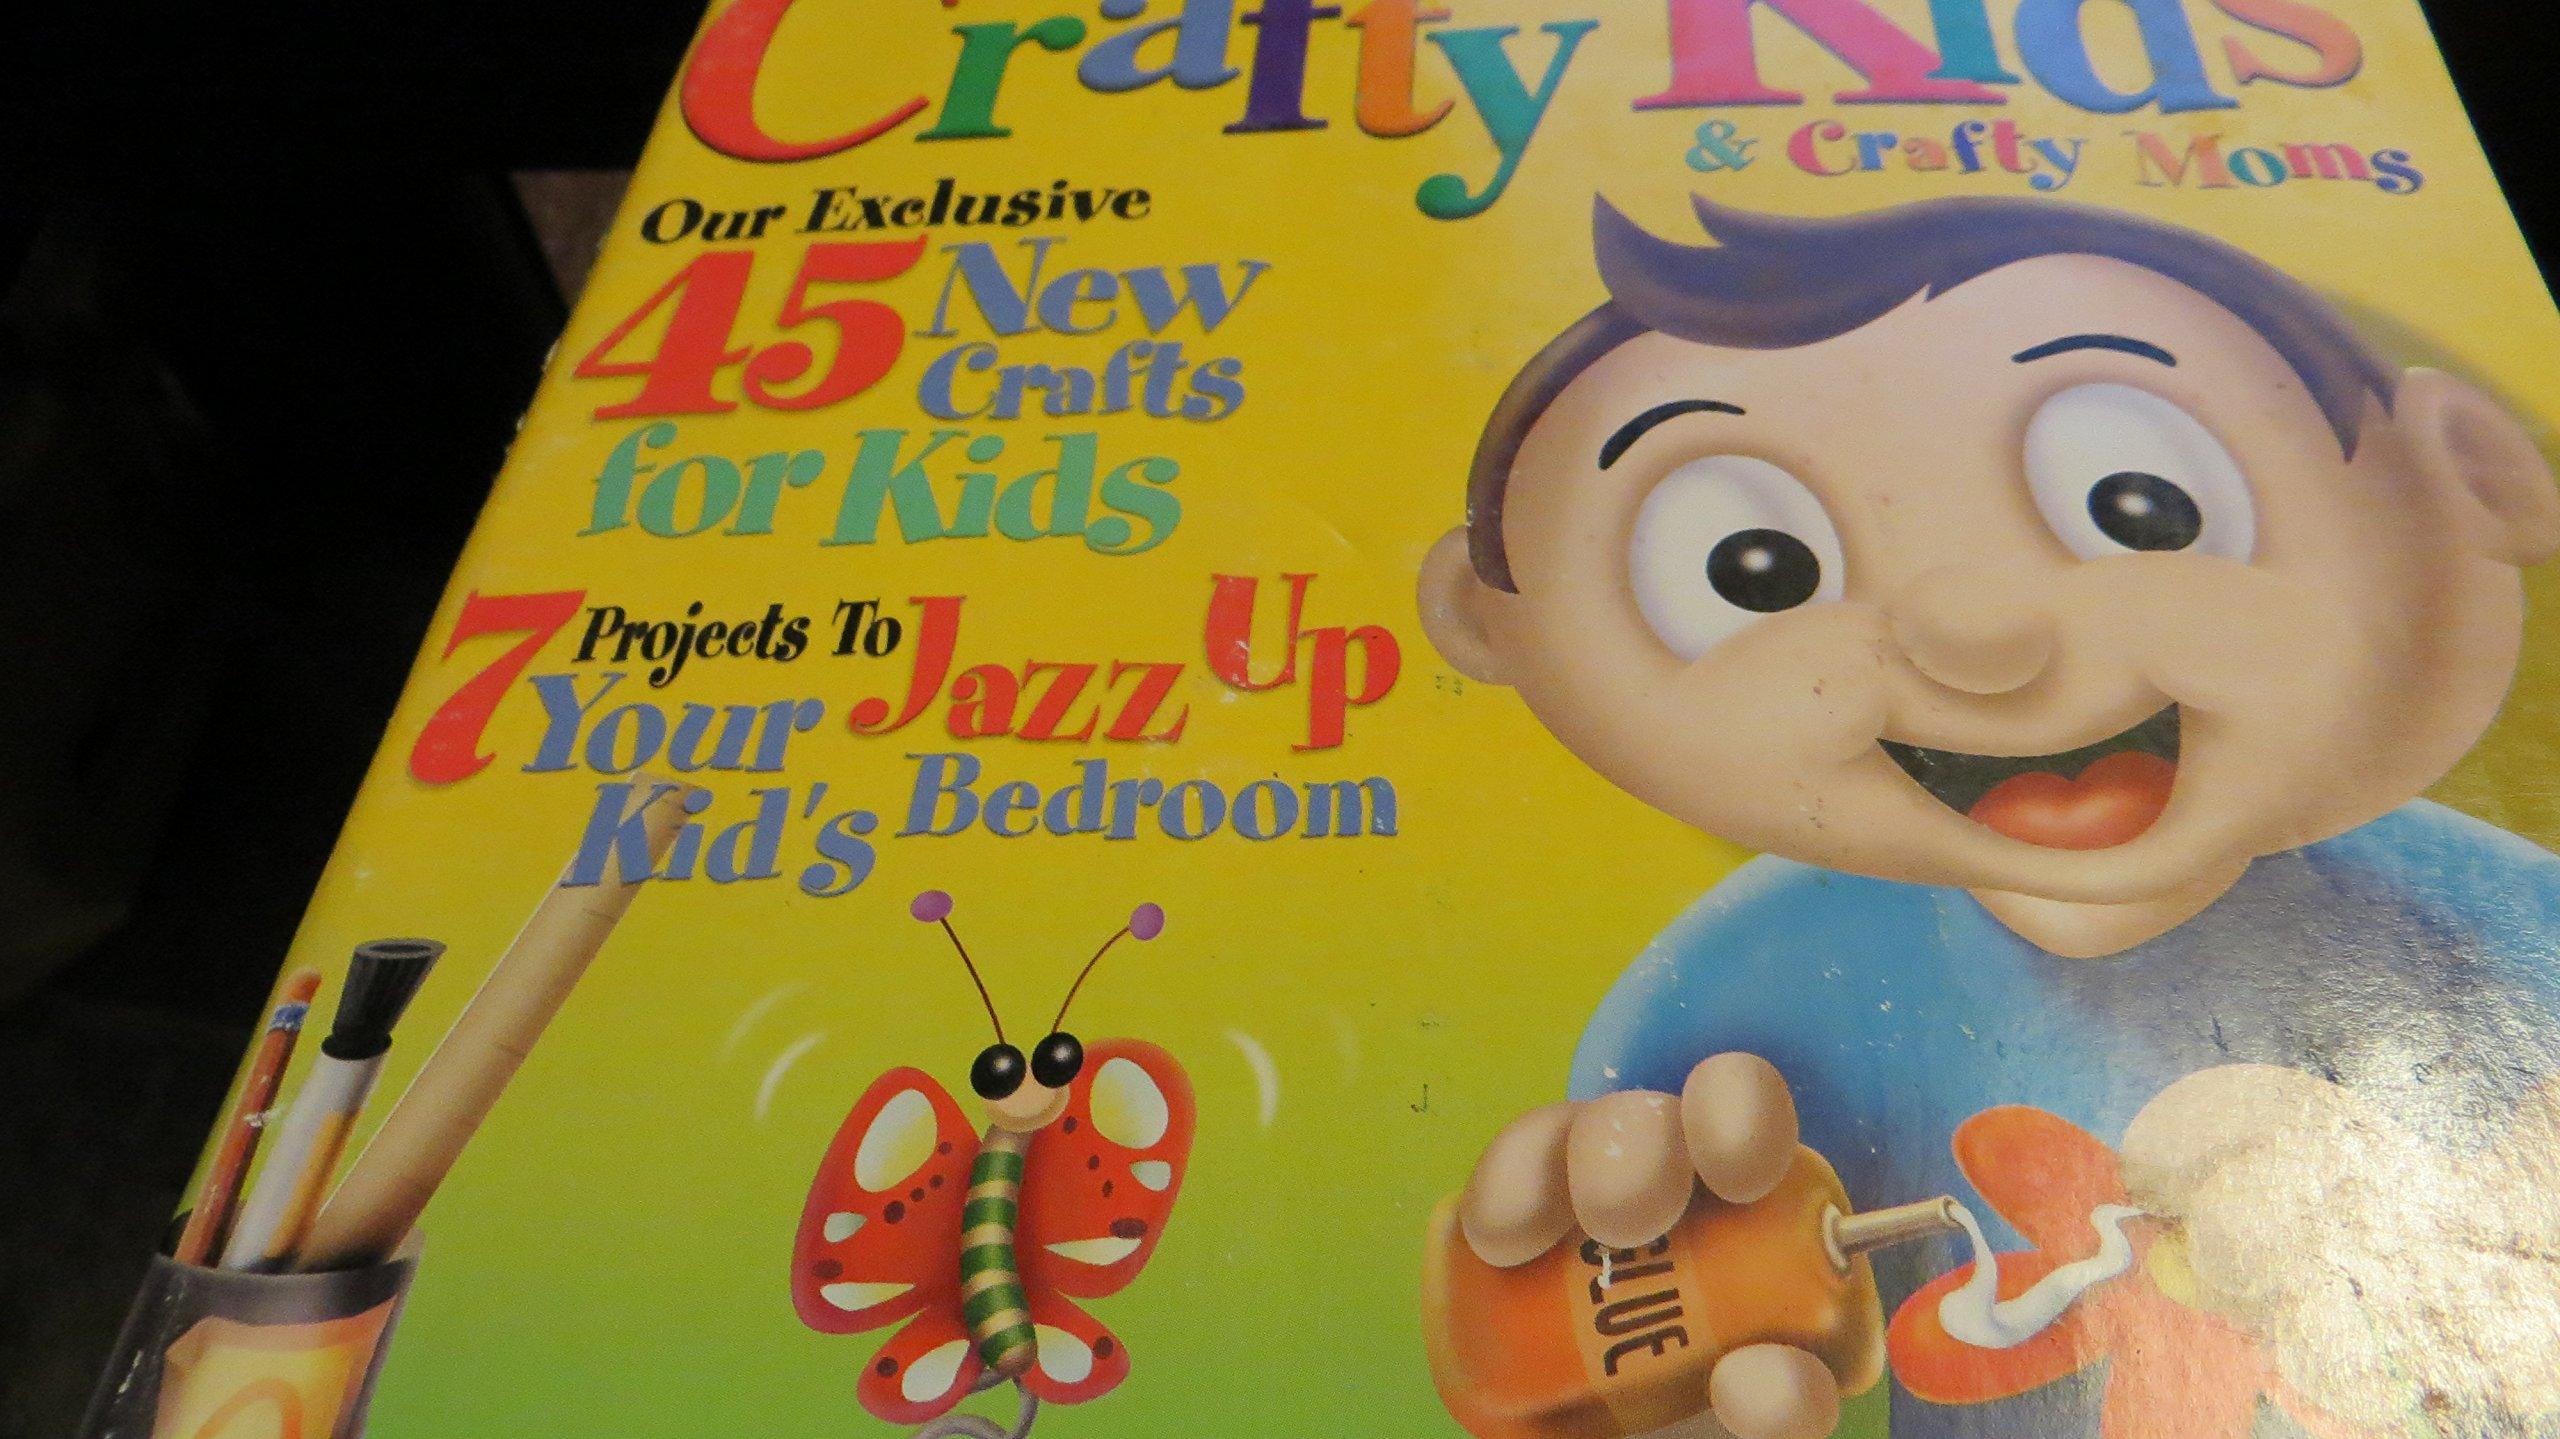 Mary Beth S Crafty Kids Crafty Moms Magazine H S Media Amazon